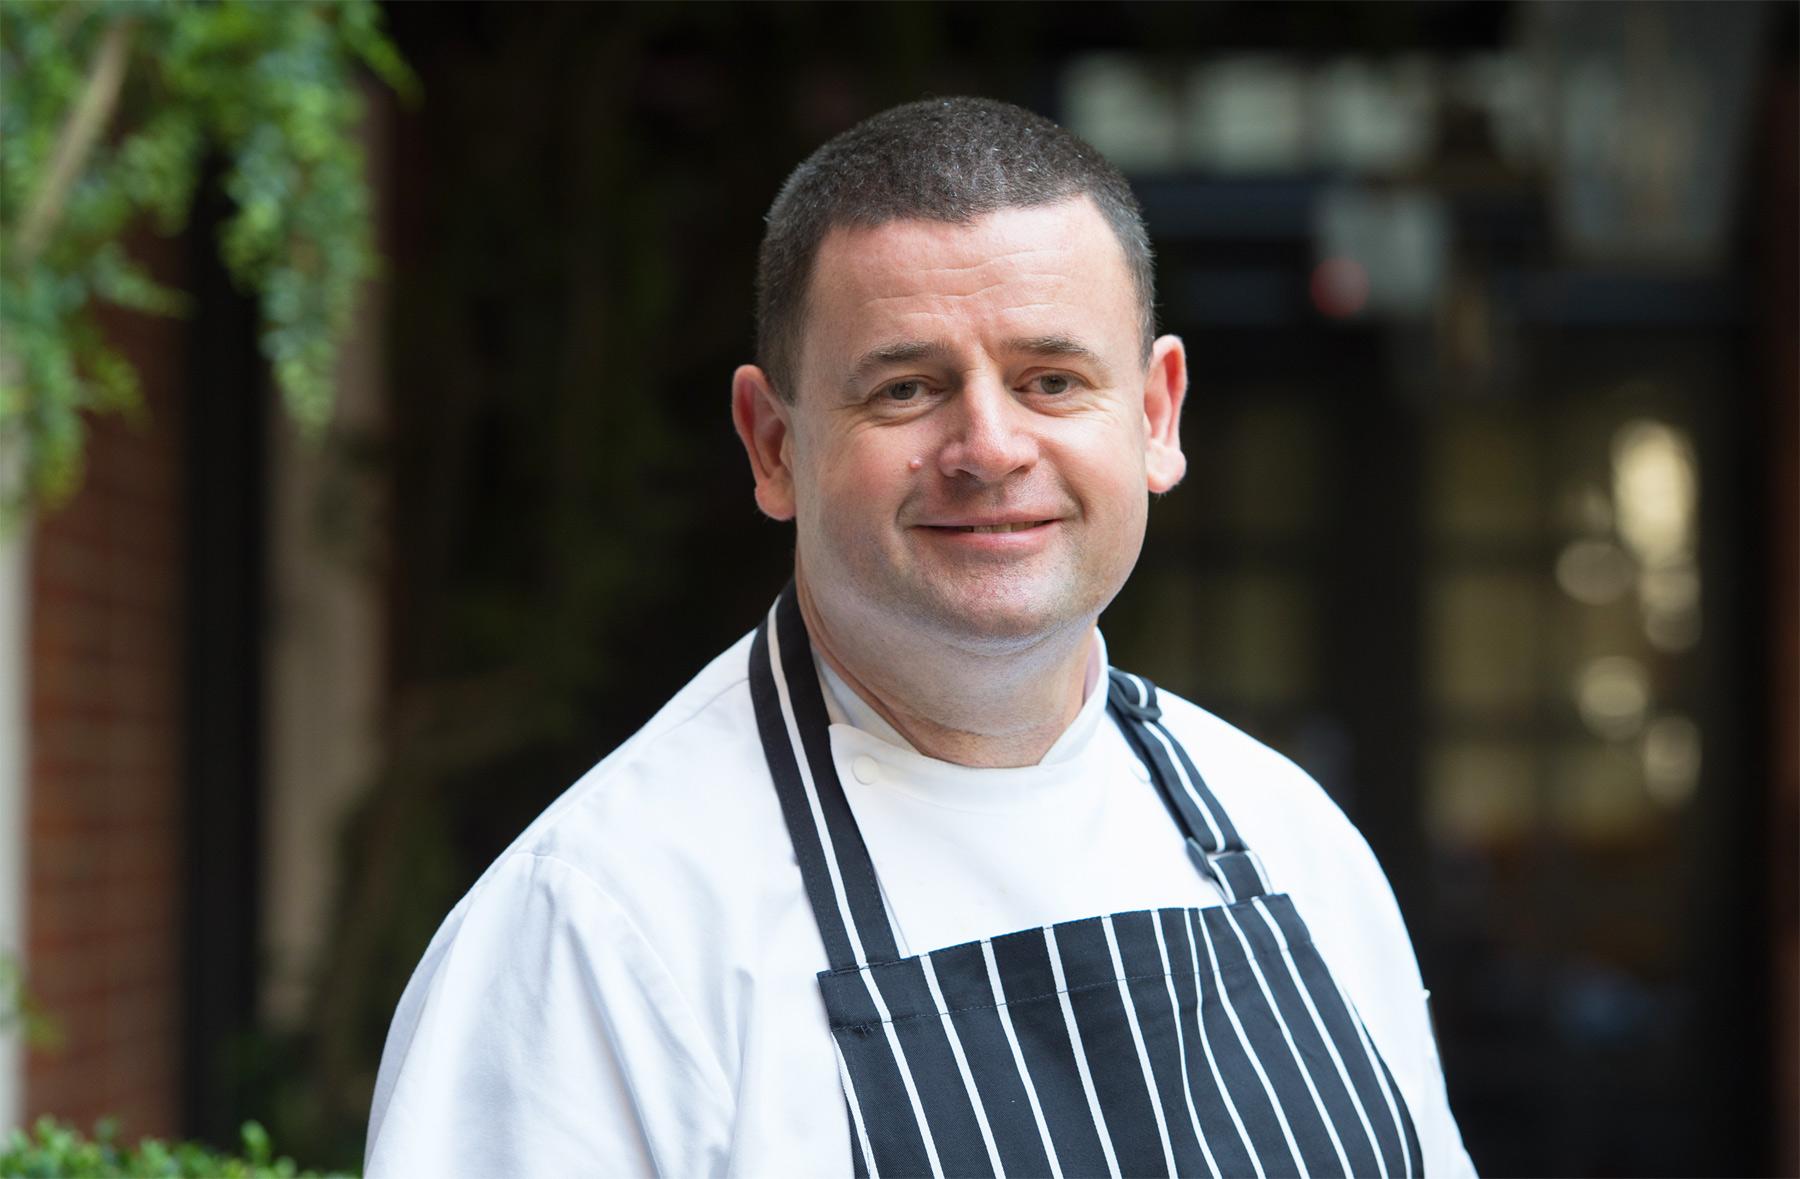 Bloomsbury Hotel's Head Chef Paul O'Brien